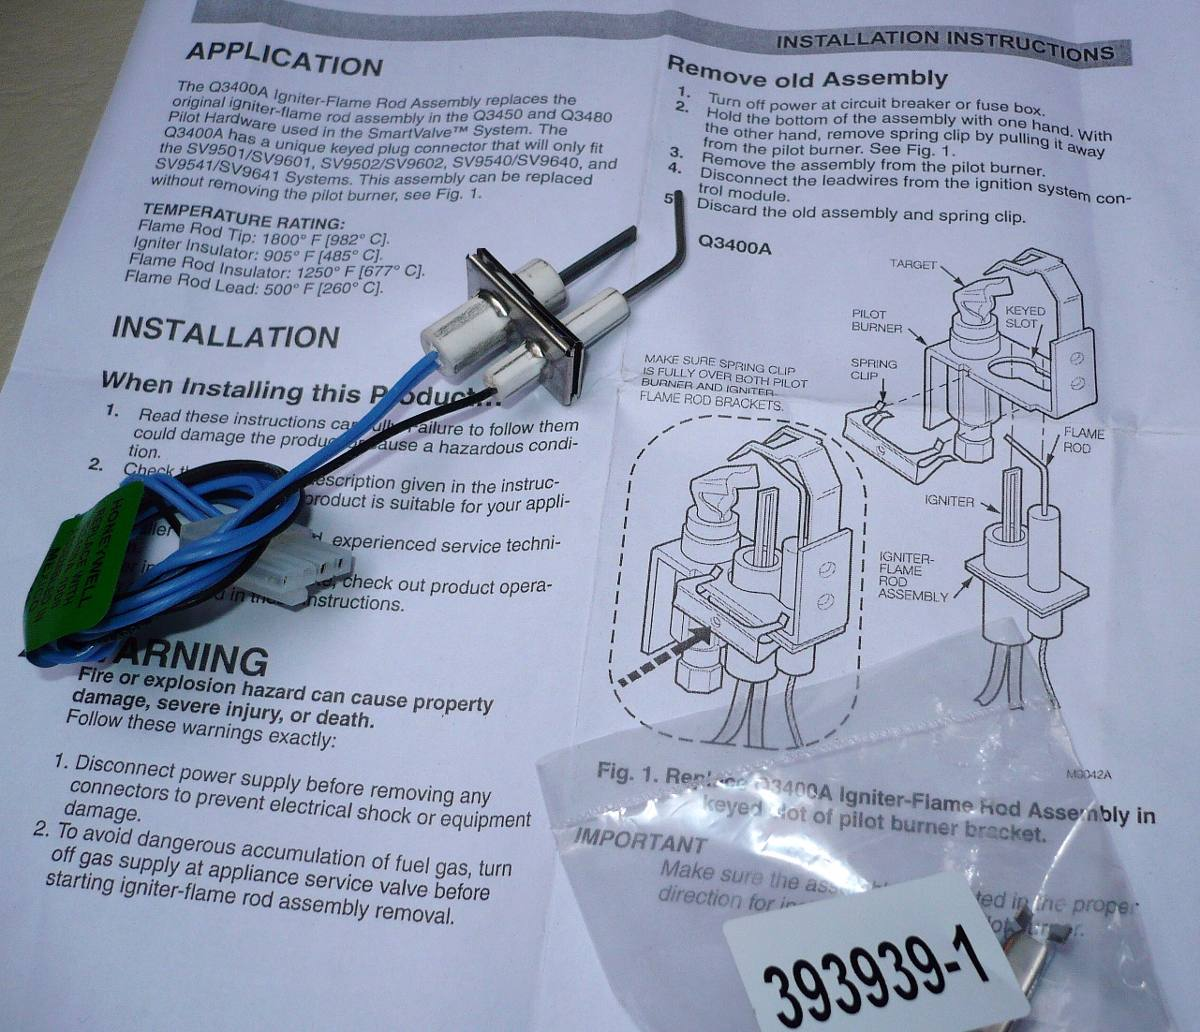 Ignitor Incandescente Honeywell Q3400a Para Válvulas Smart Valve Modelos  Sv9501 Y Sv9541